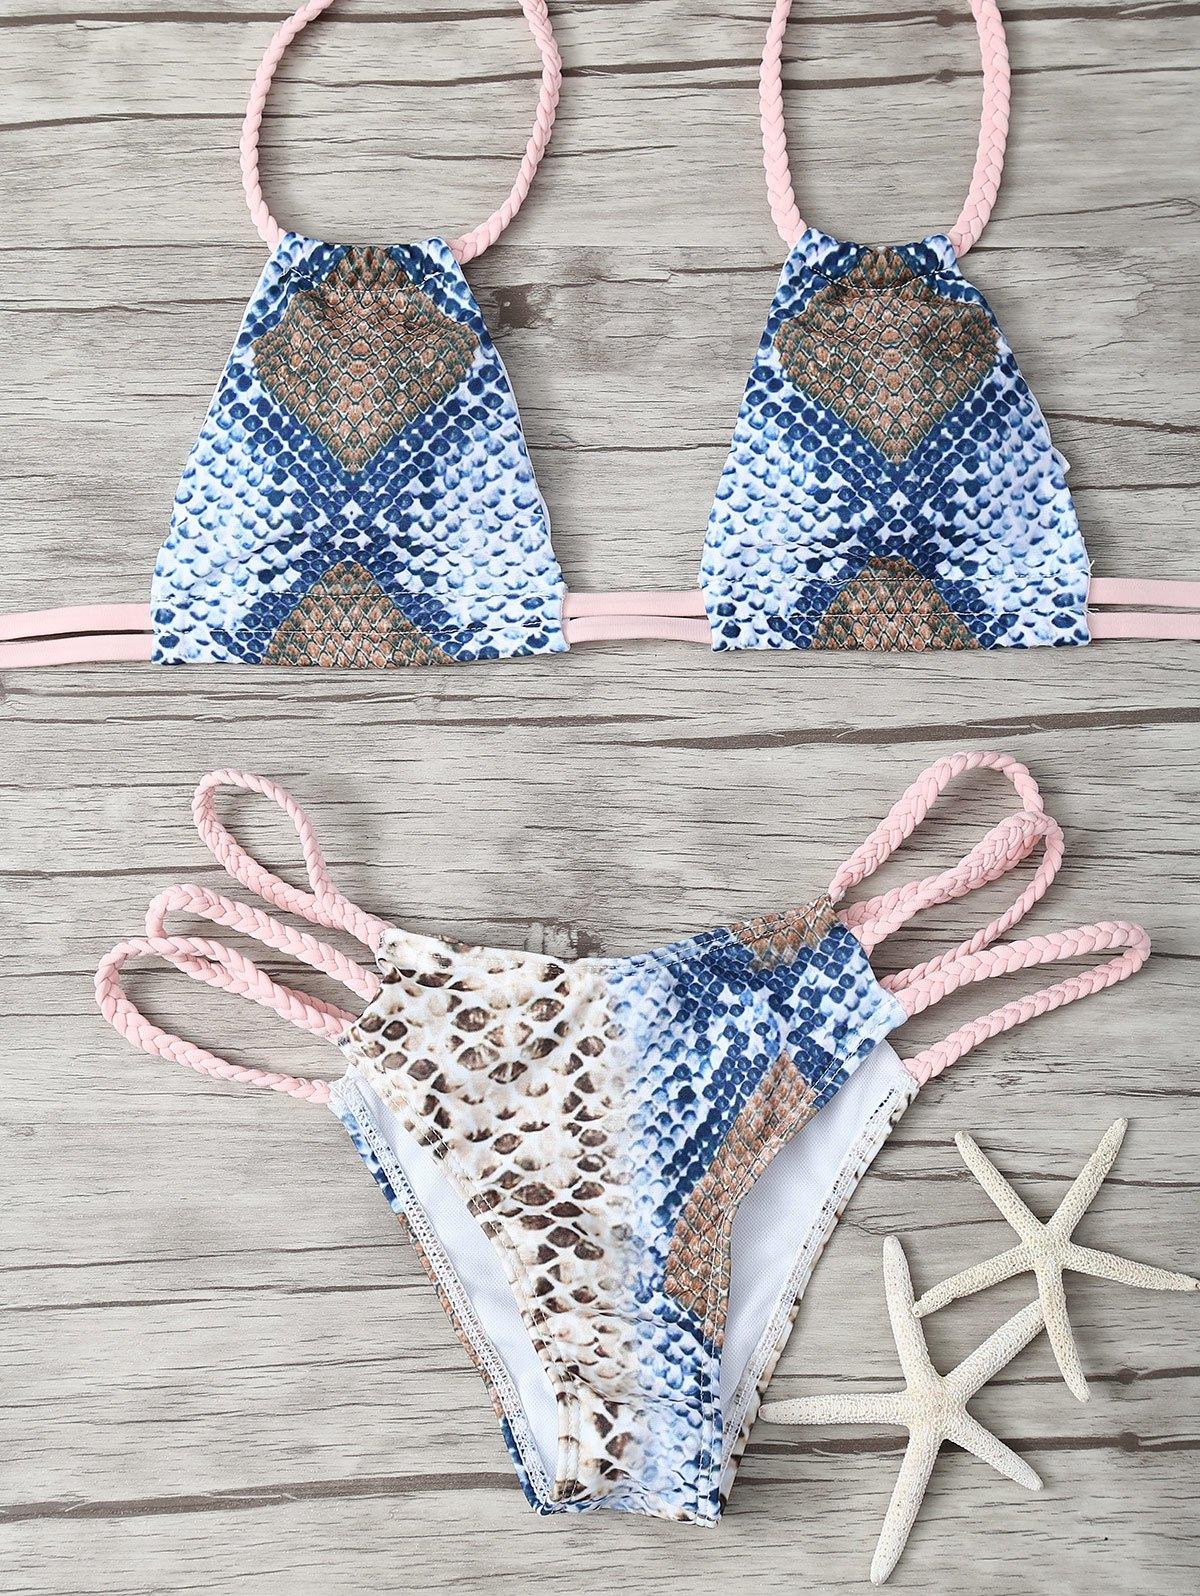 Snakeskin Print Braided Straps Bikini